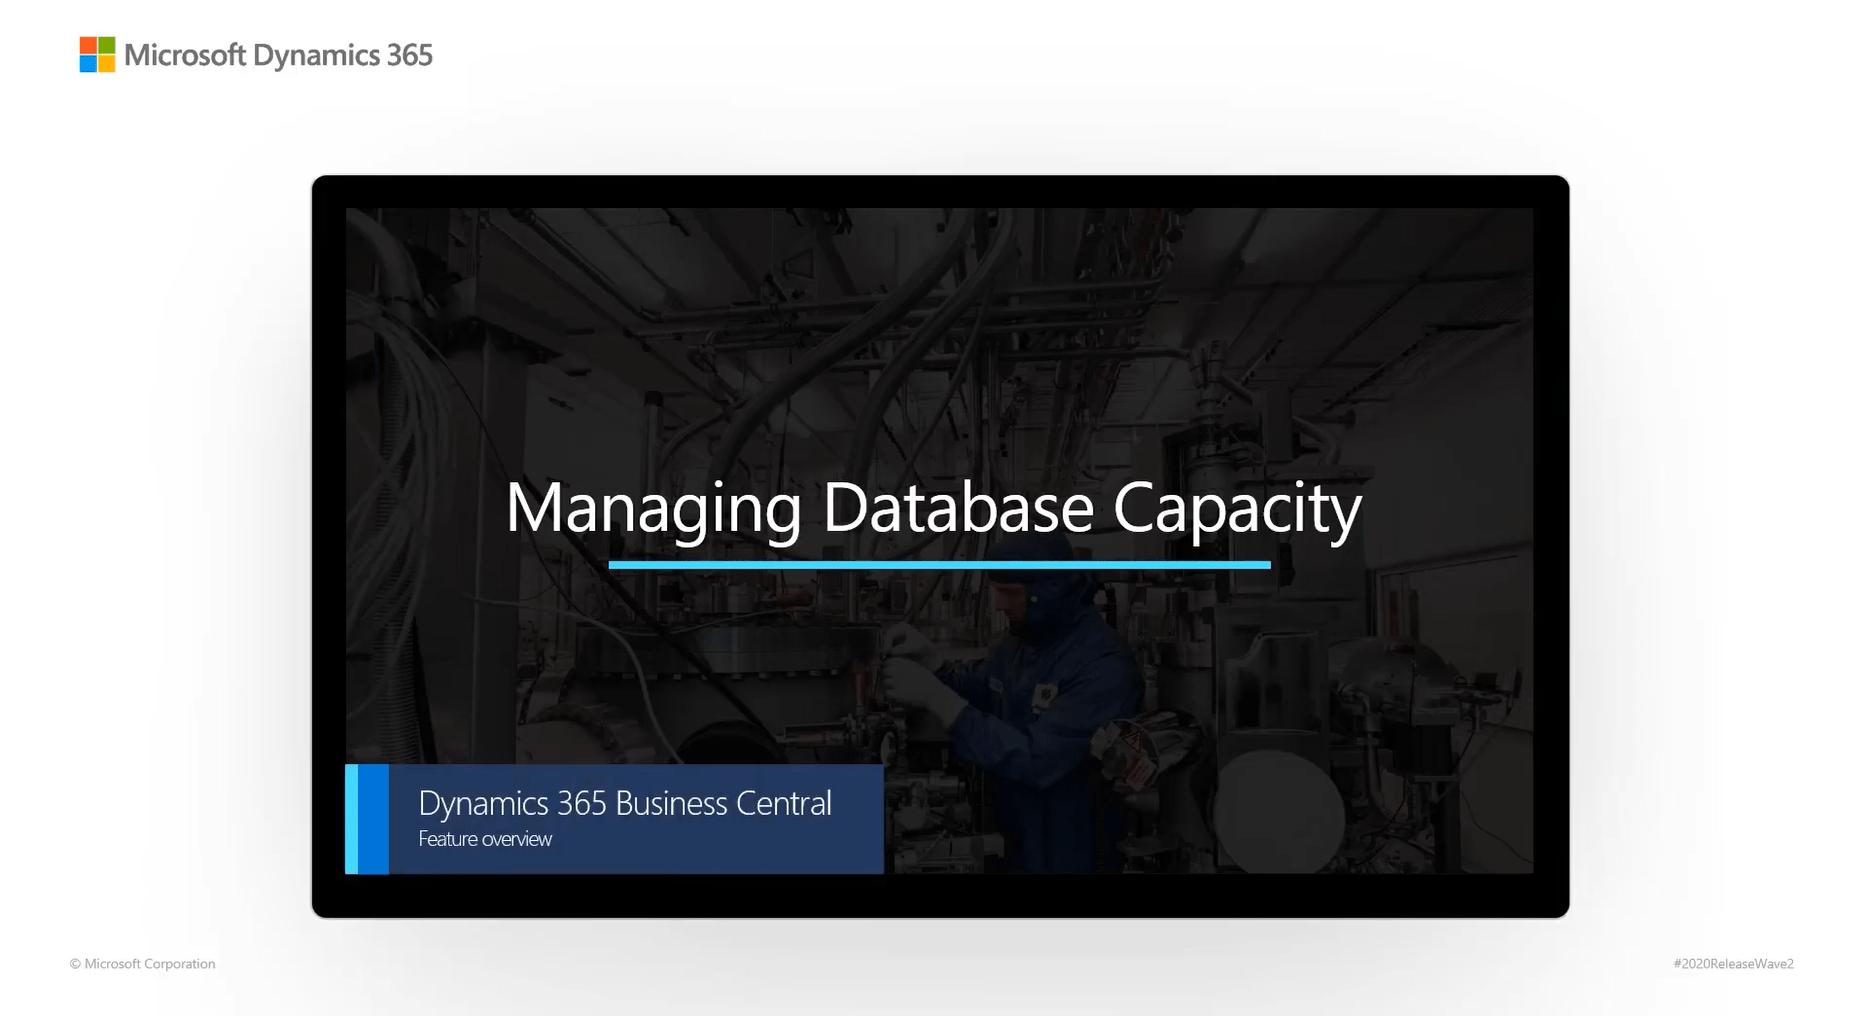 Managing Database Capacity